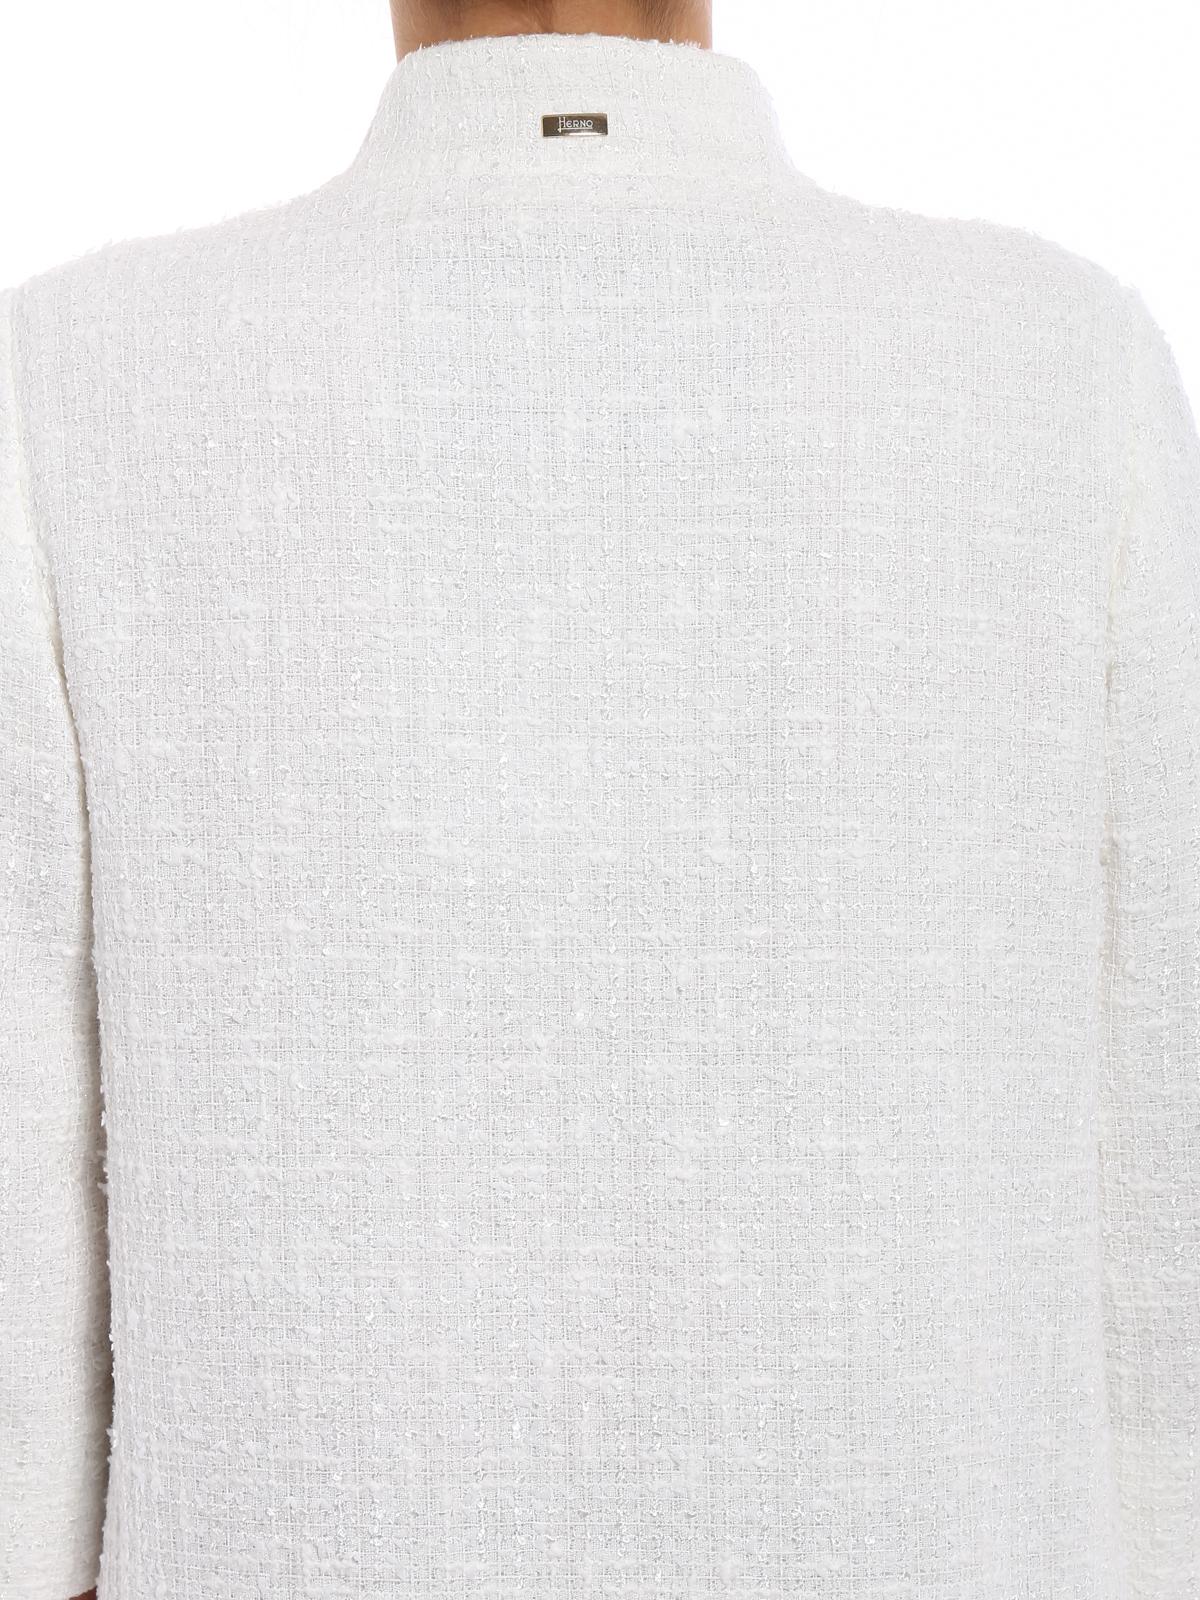 Cappottino lurex bianco